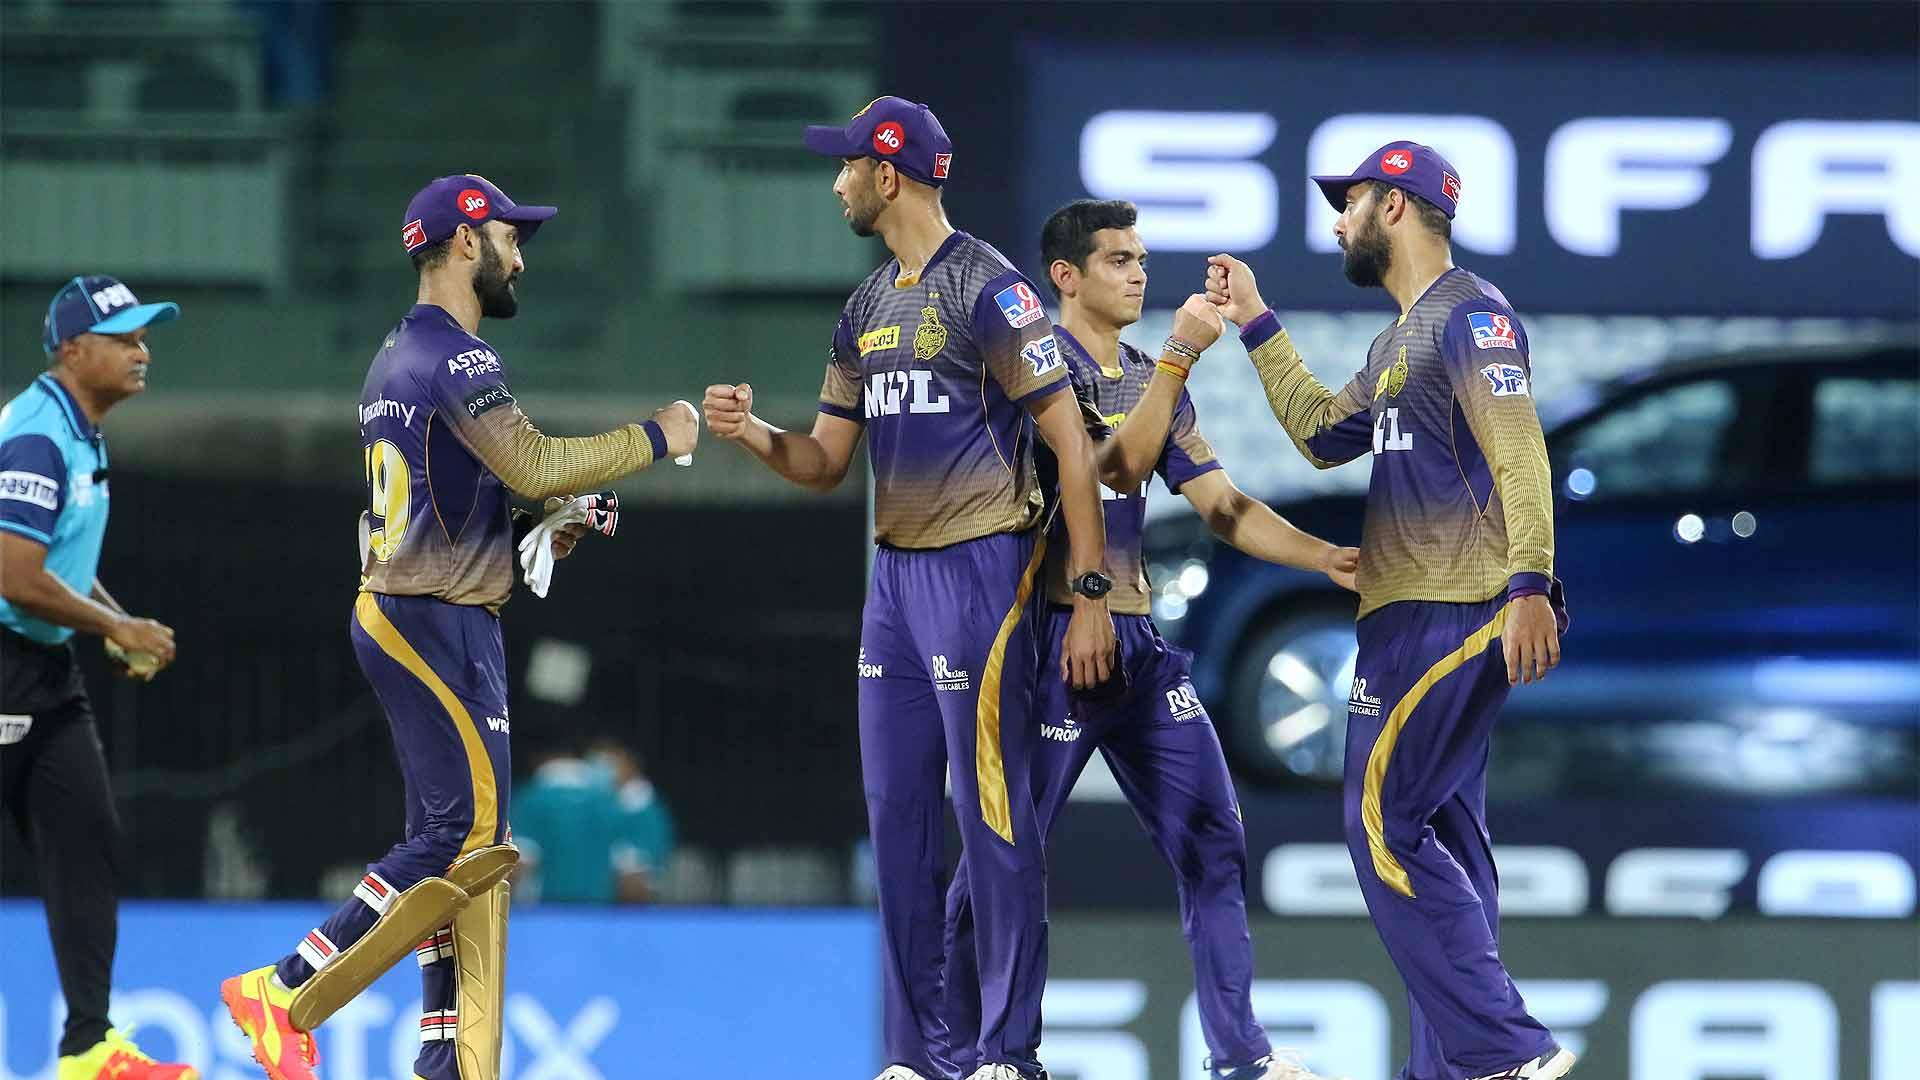 In Pics: How Kolkata Knight Riders registered their 100th IPL win